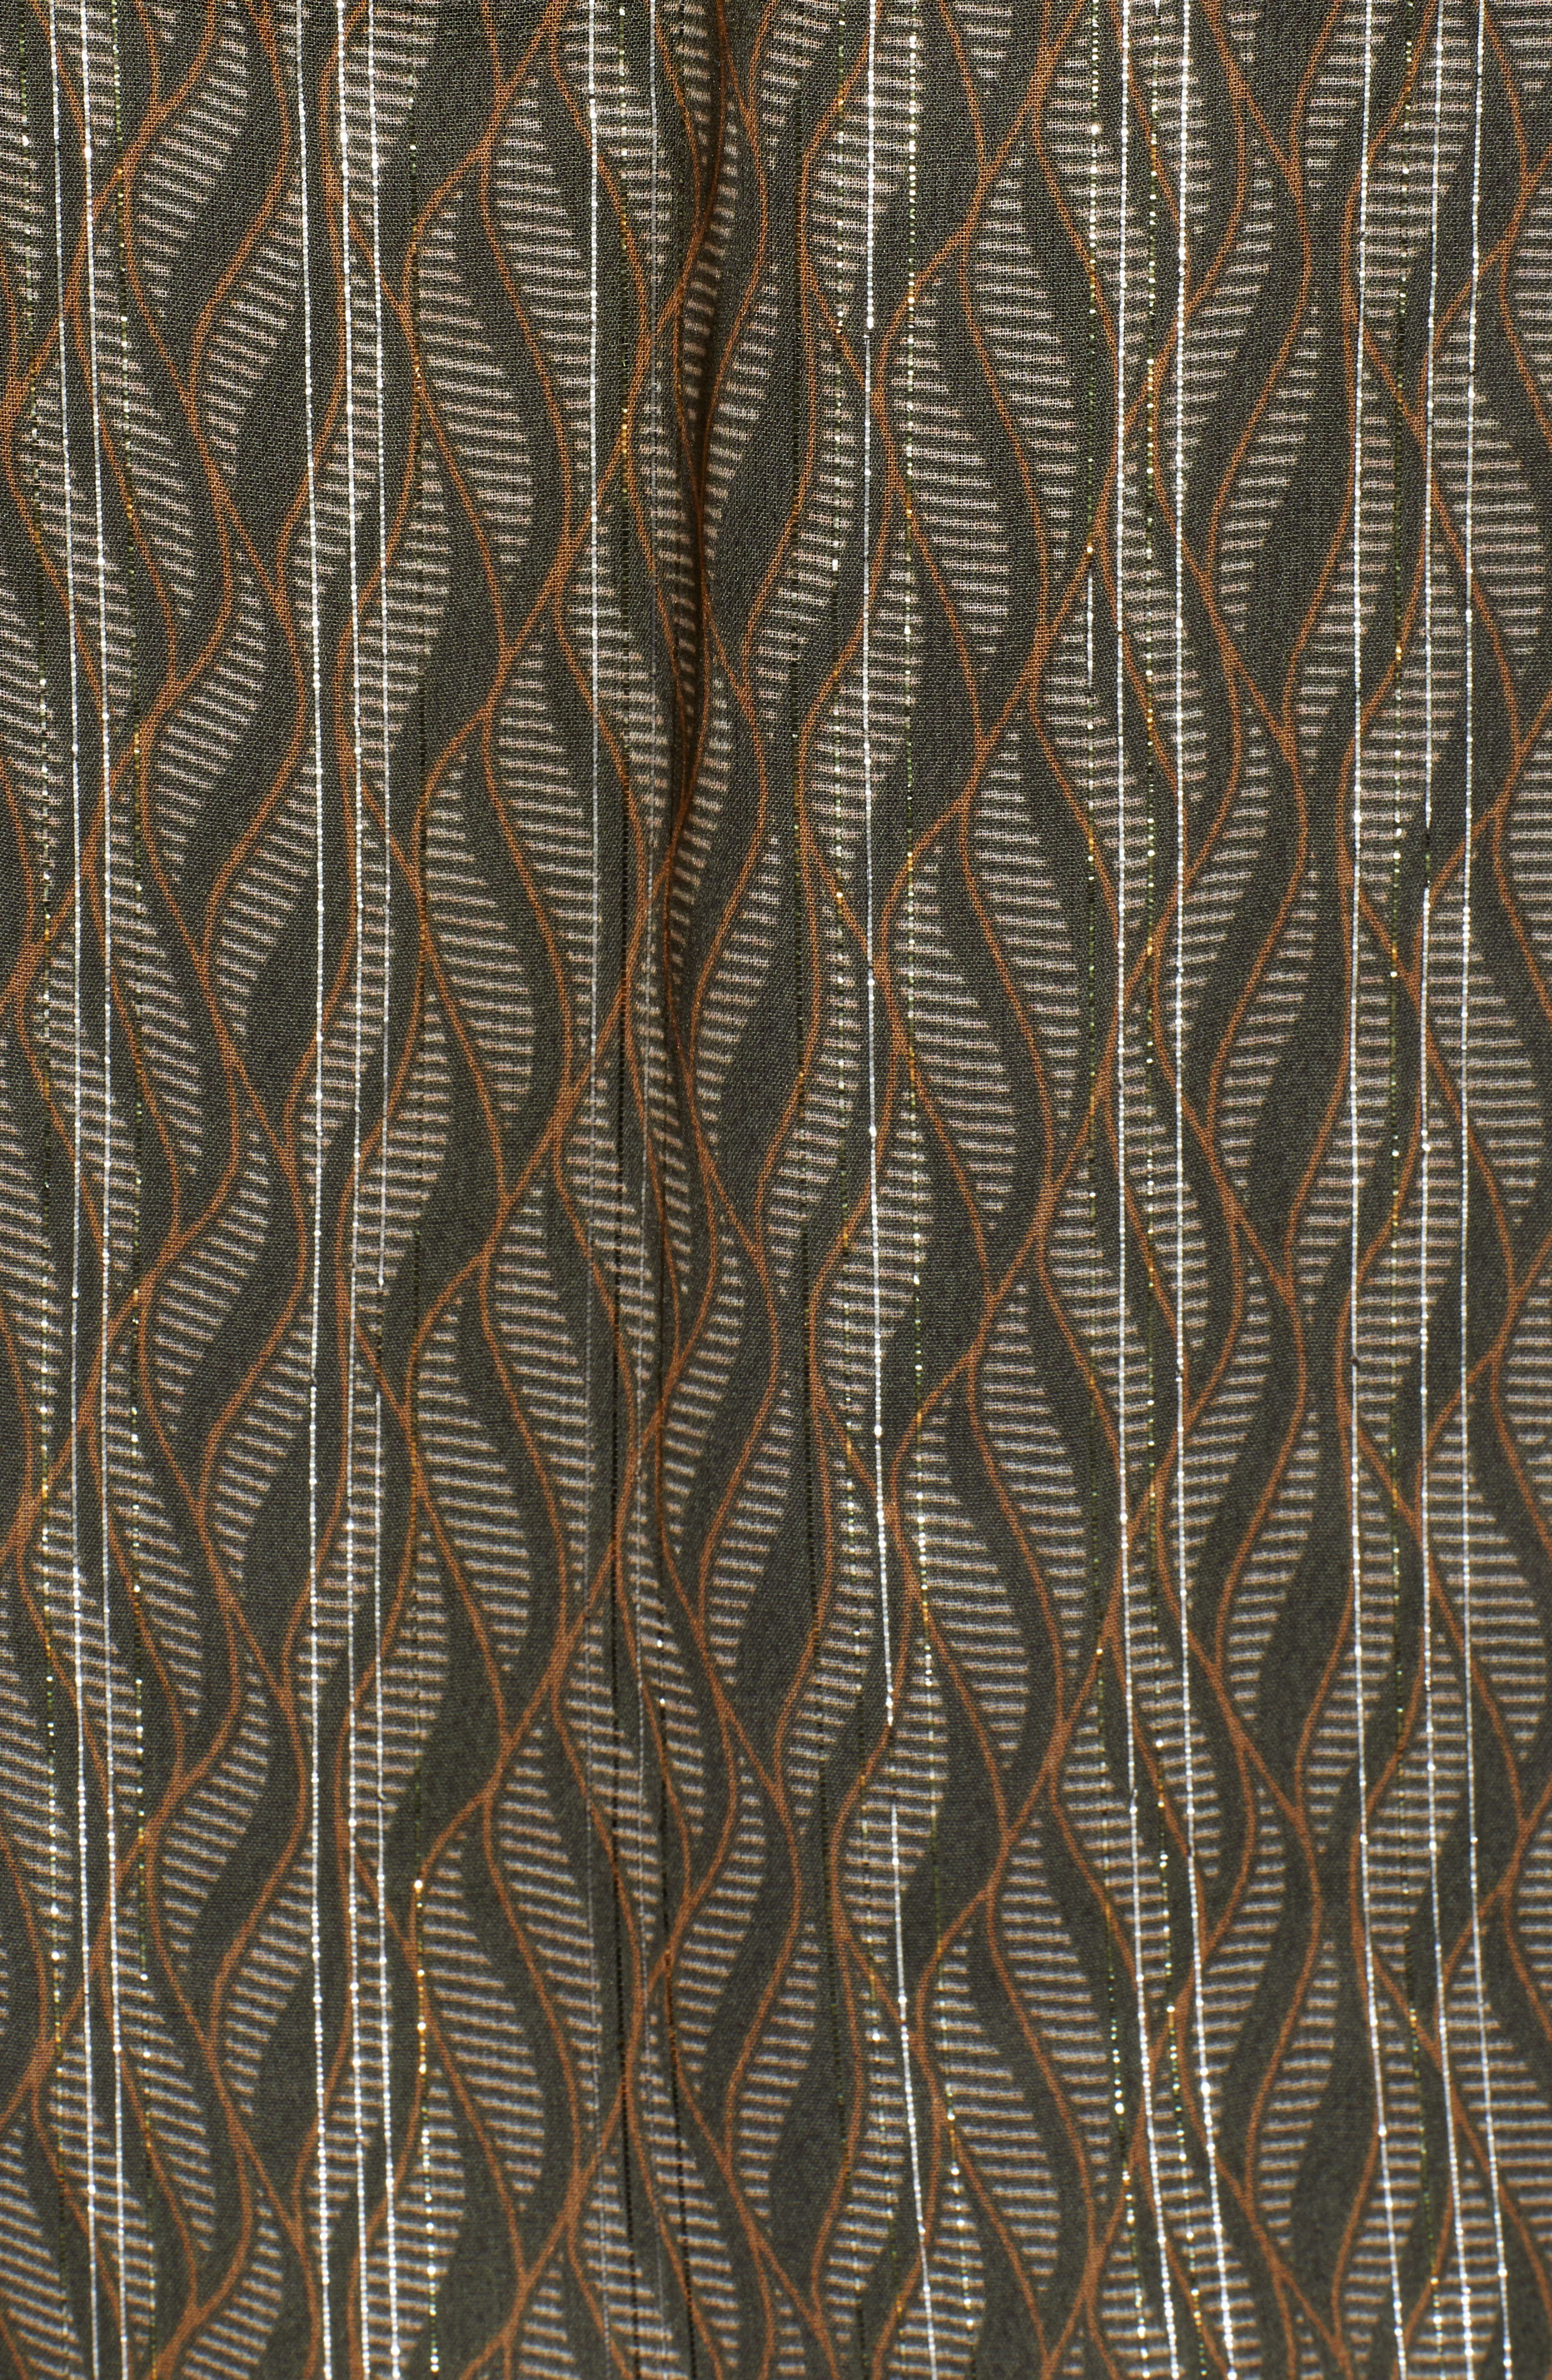 Metallic Detail Sheer Ruffle Blouse,                             Alternate thumbnail 5, color,                             SAGE GREEN PRINT W/